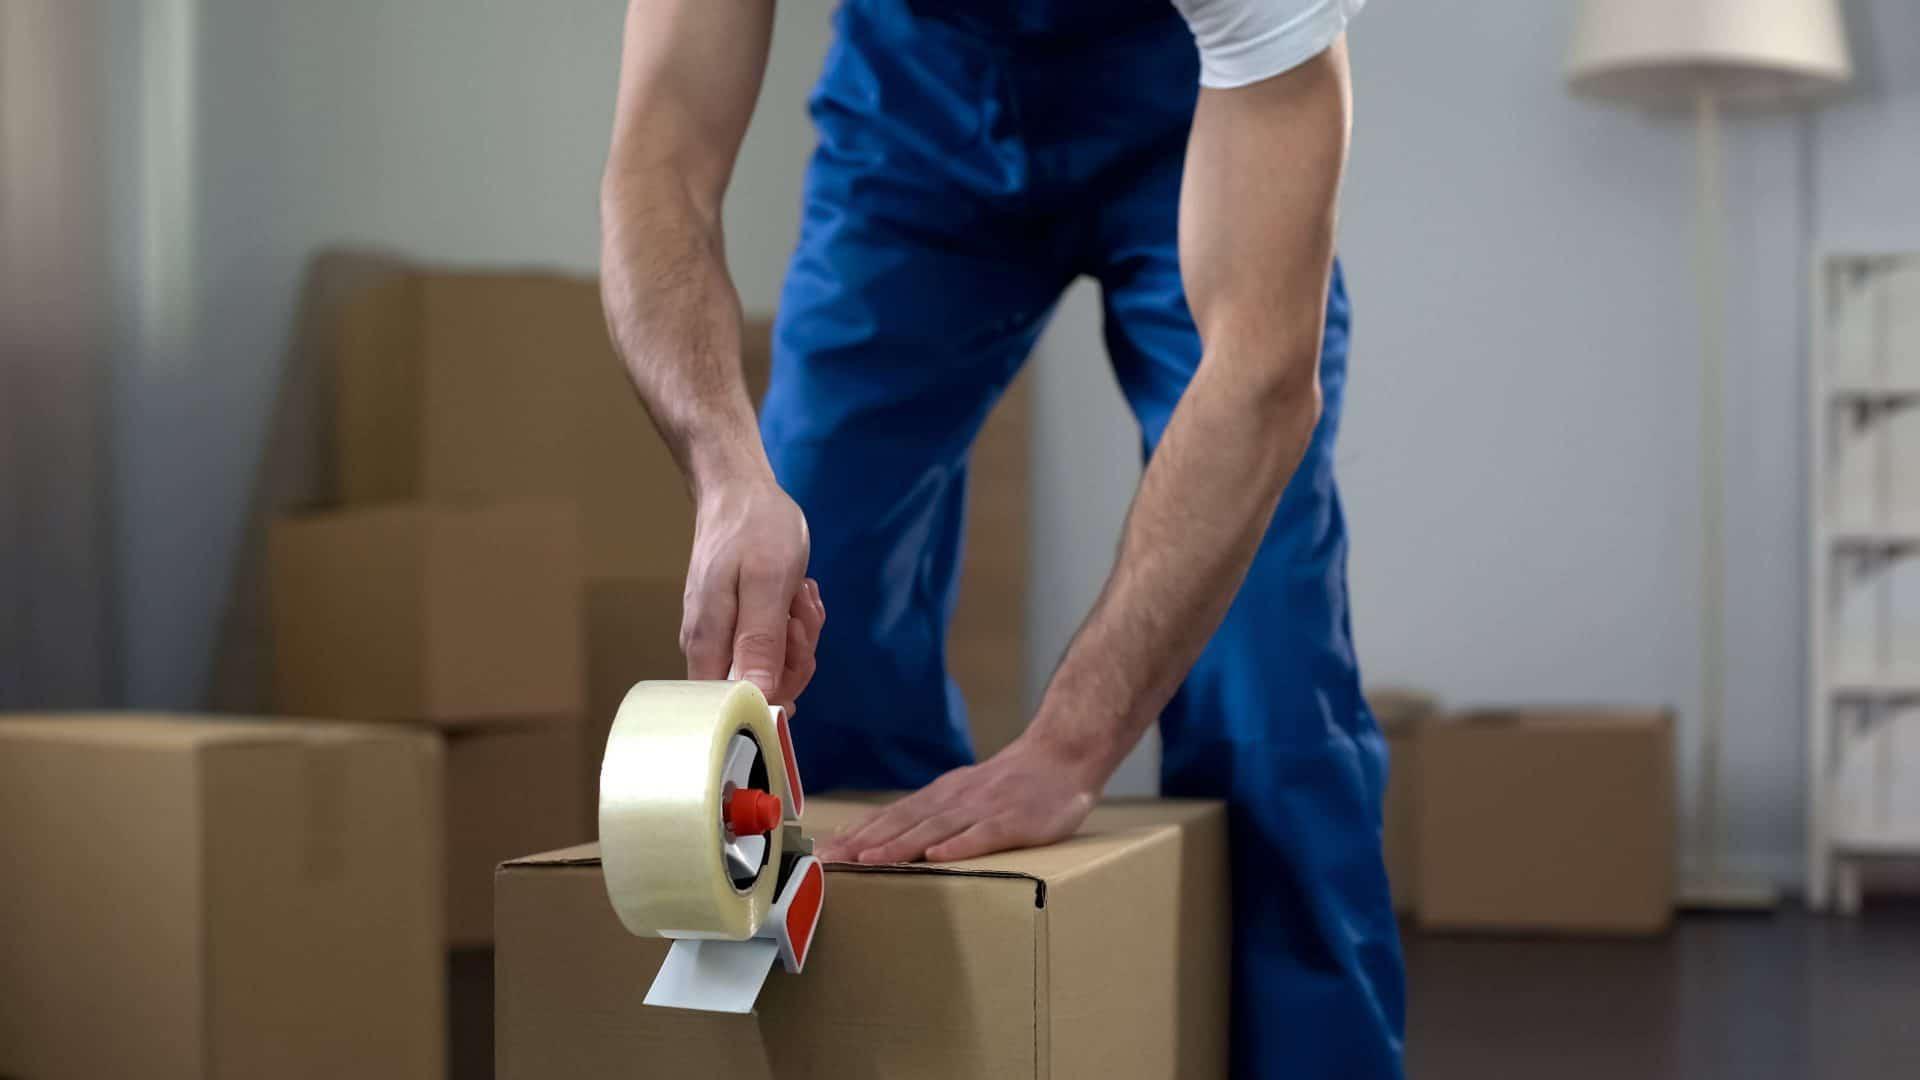 déménagement stockage meubles